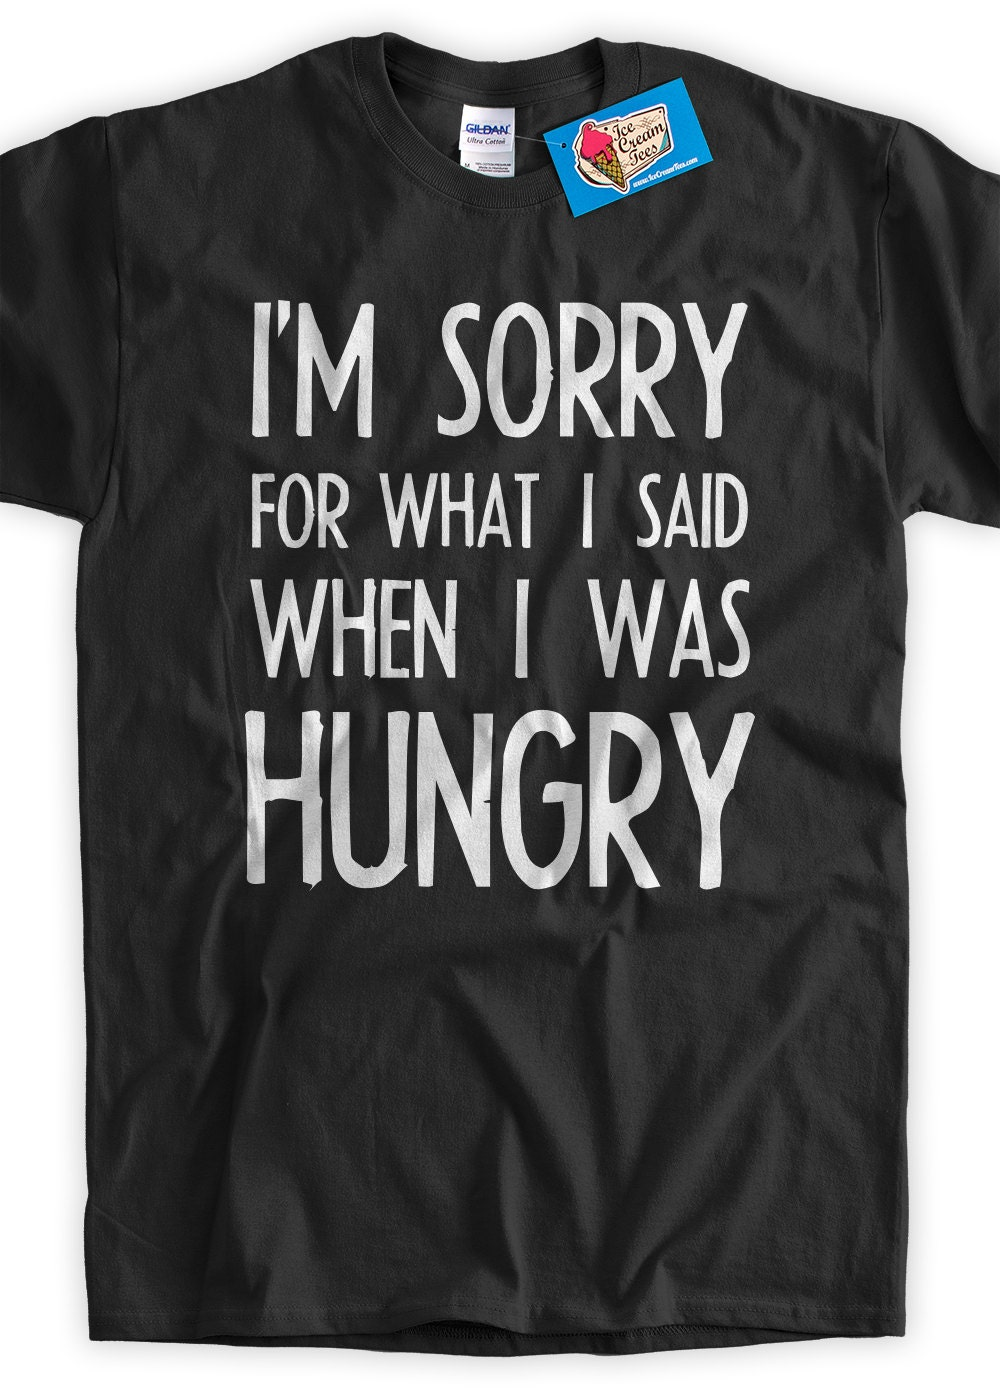 I'm Sorry for what I said when I was Hungry Shirt V2 white ink typography tshirt Screen Printed T-Shirt Tee Shirt T Shirt Mens,Ladies